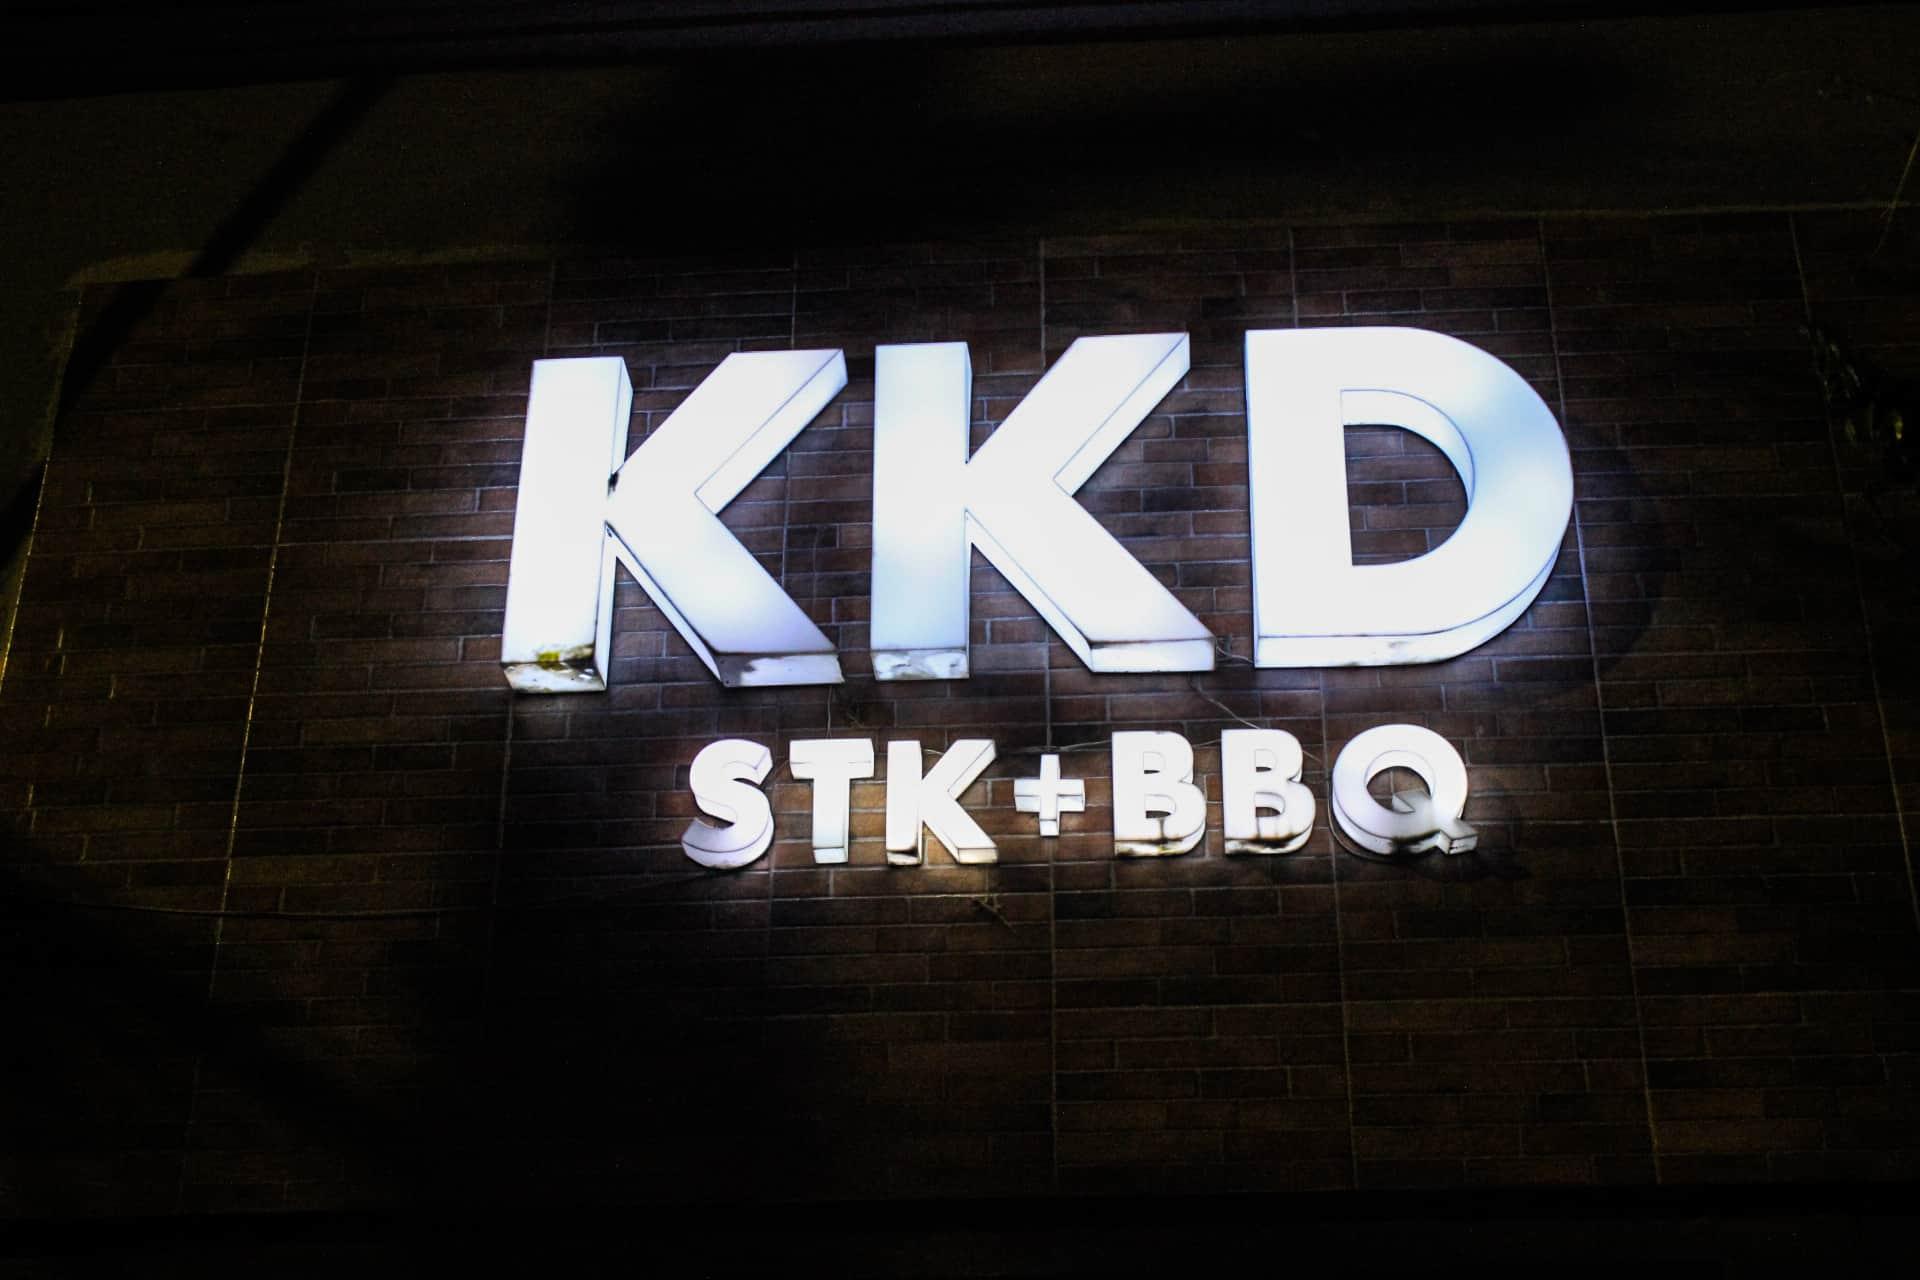 kkd-stk-bbq-cebu